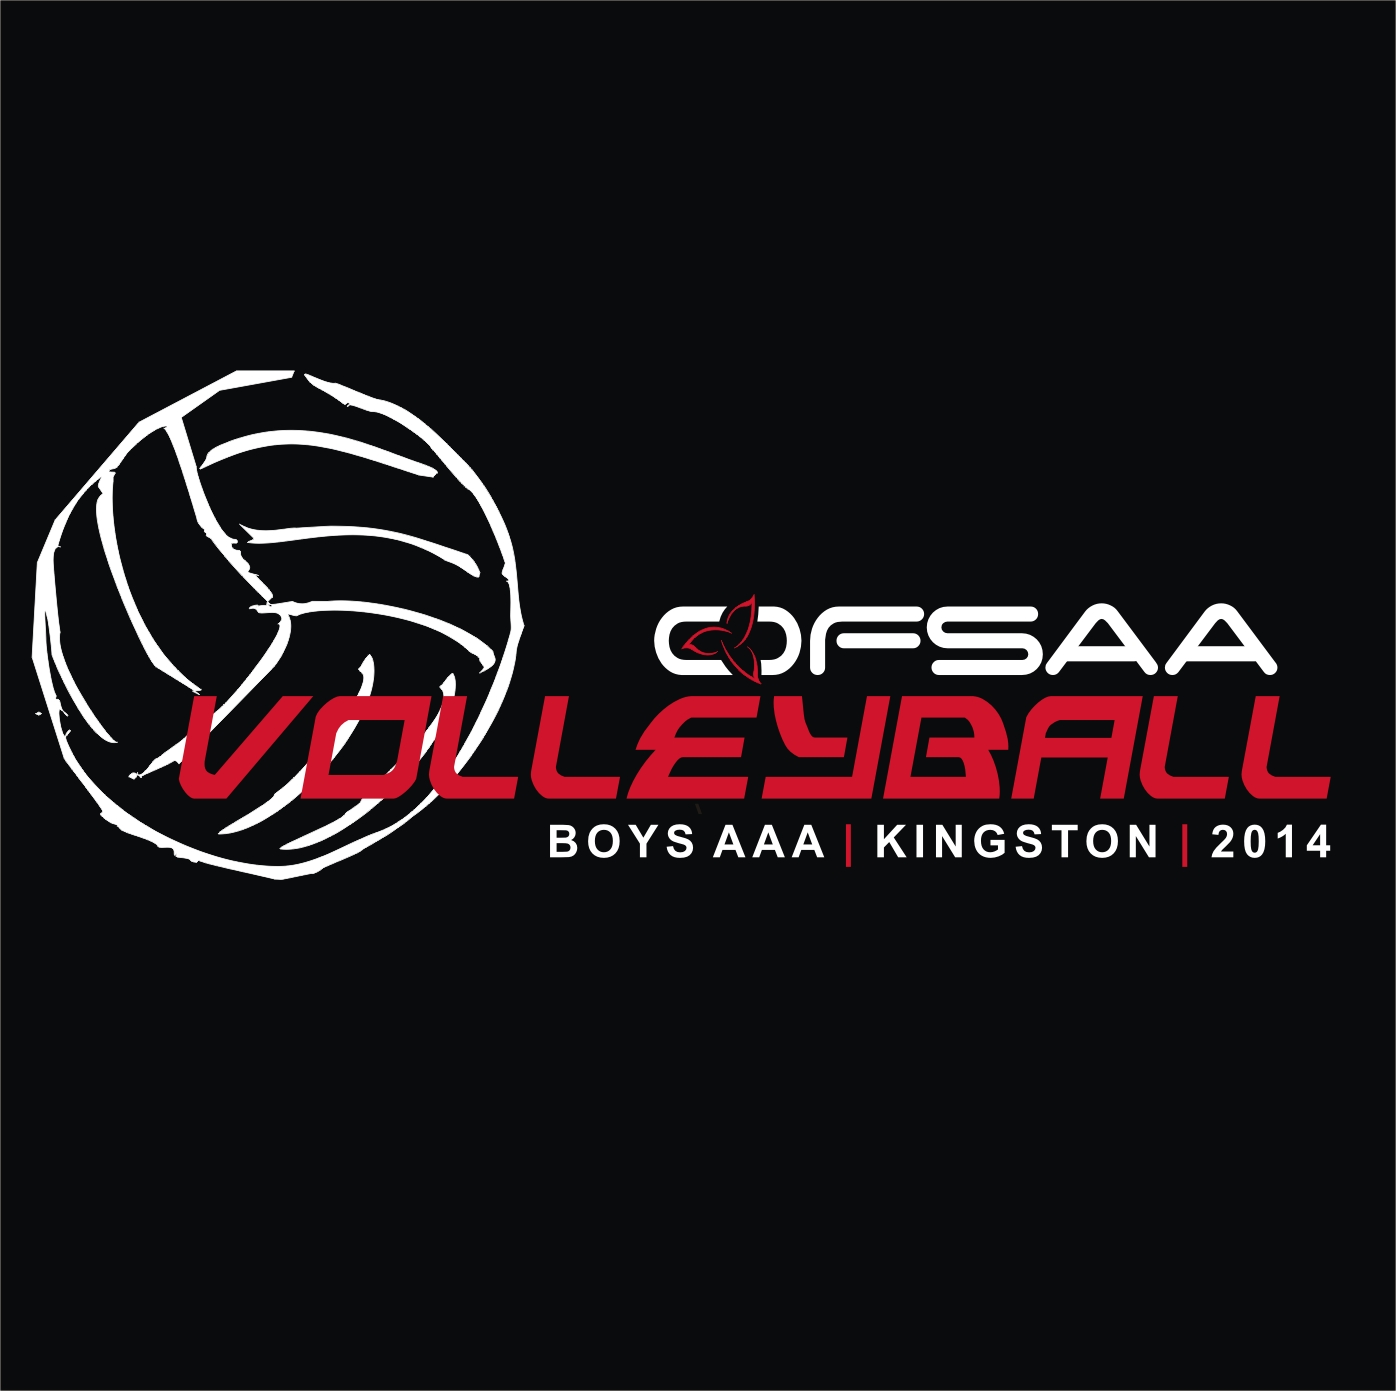 Boys 3A Vball logo on black.jpg